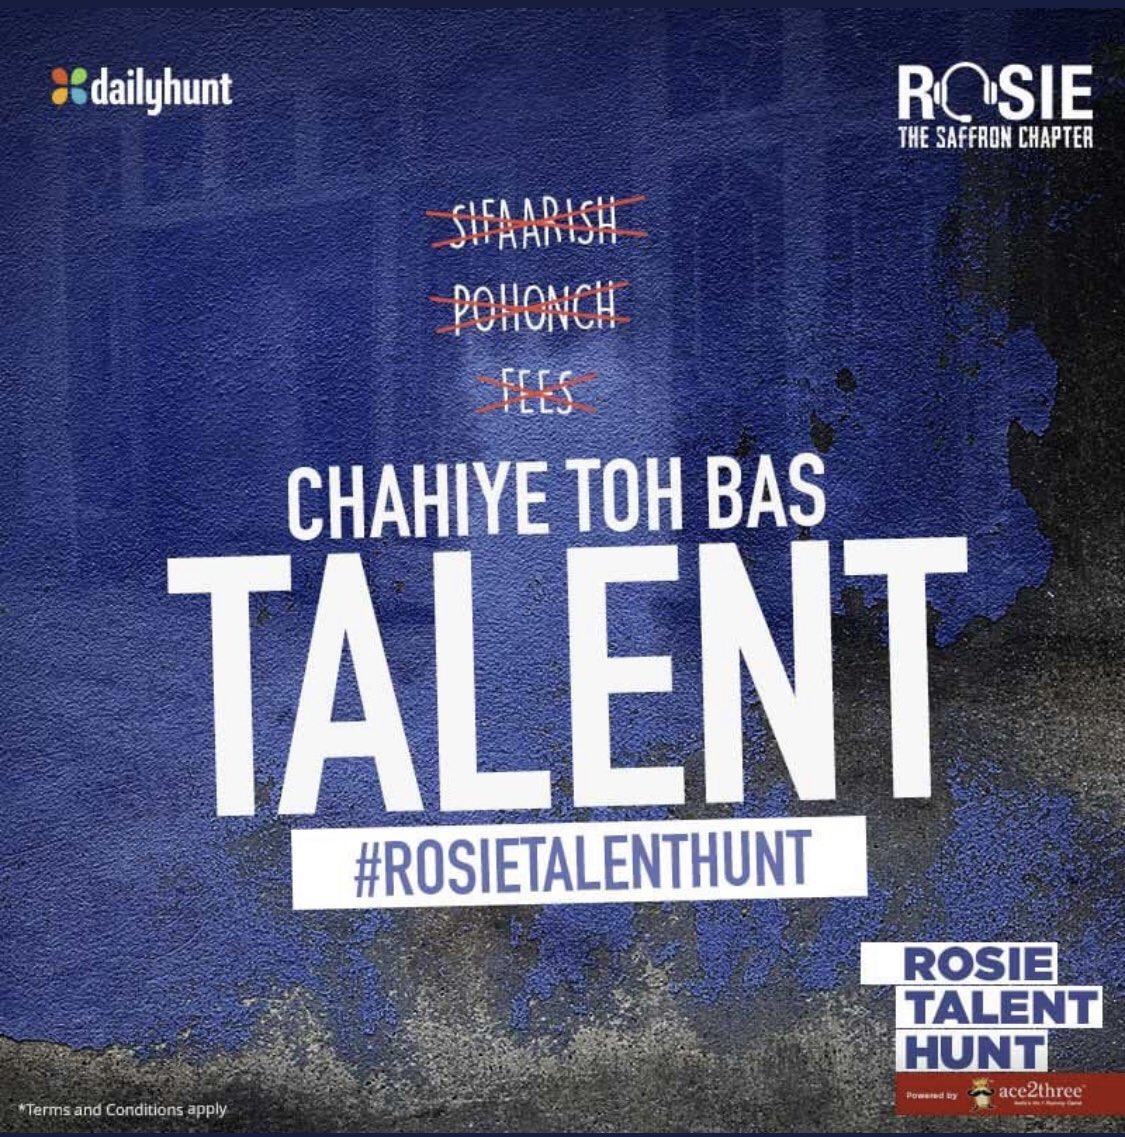 Only the power of pure talent will make it through,upload your auditions now & the best one will star in prominent role alongside lead cast in my film @RosieIsComing @vivekoberoi @mandiraa_ent #PrernaVArora @IKussum @girishjohar @d_reshabh @Ikeyurpandya @u_dhanesh @sanjeetyermal